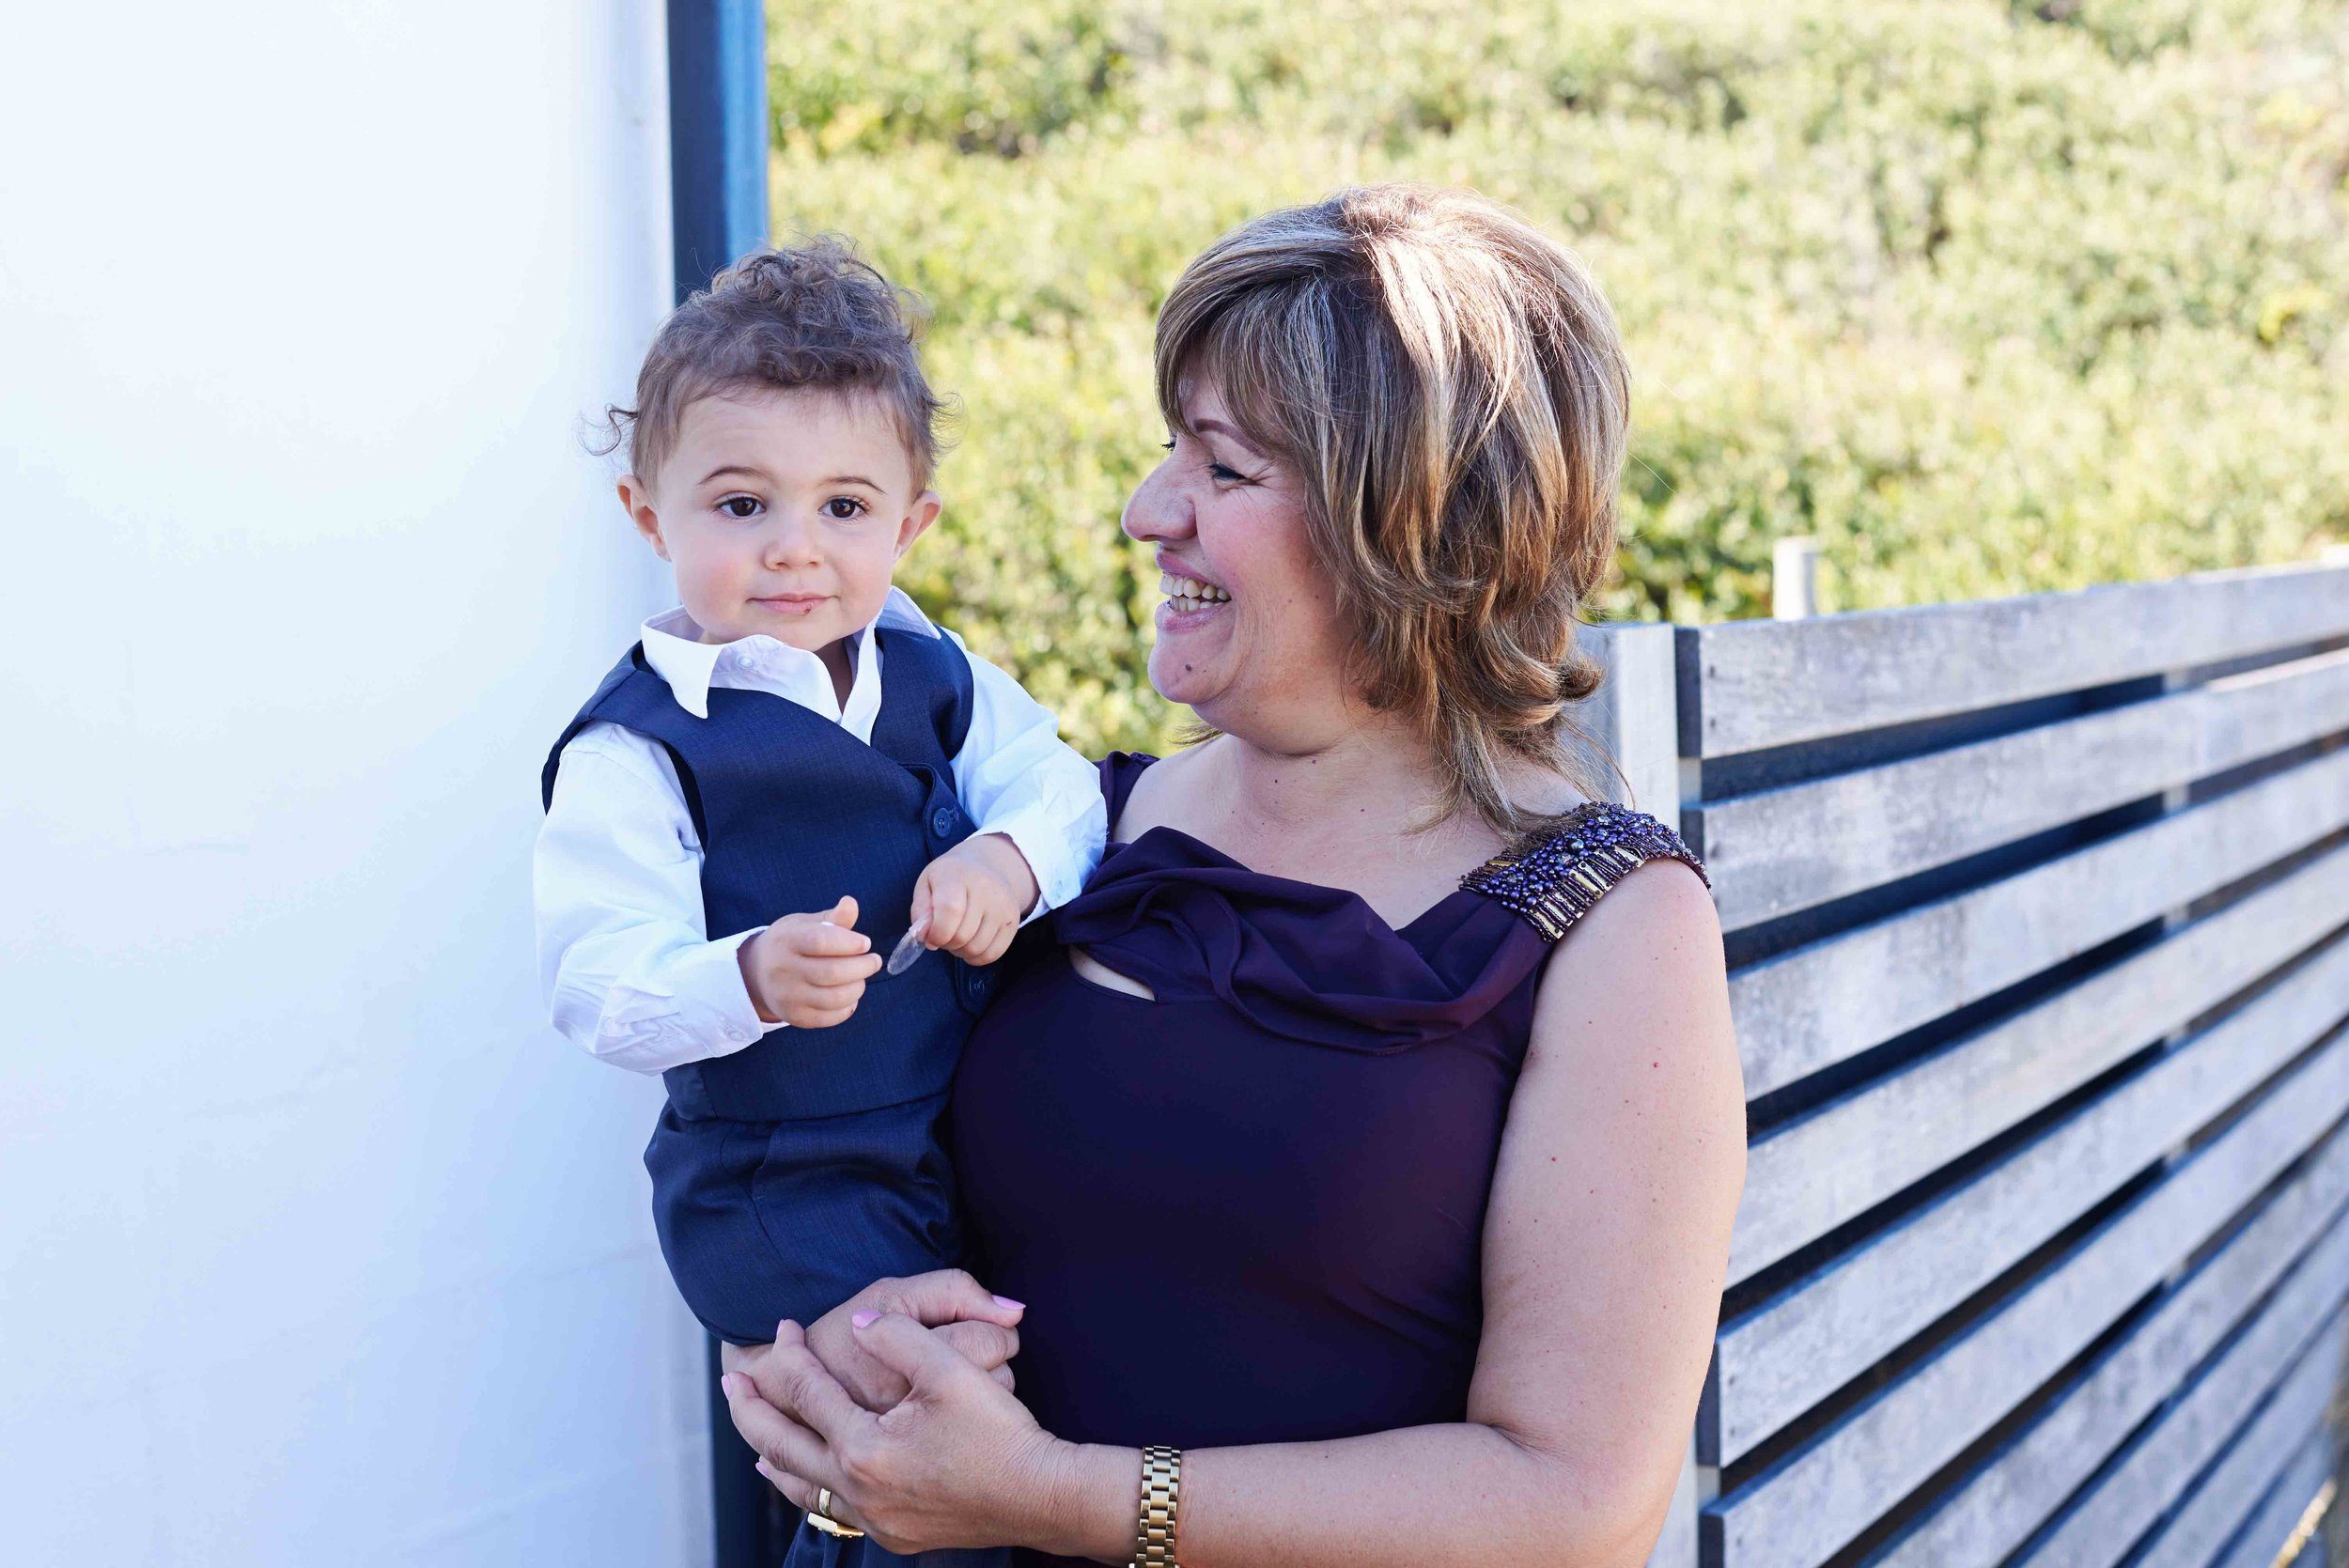 sorrento-wedding-photography-all-smiles-marissa-jade-photography-64.jpg